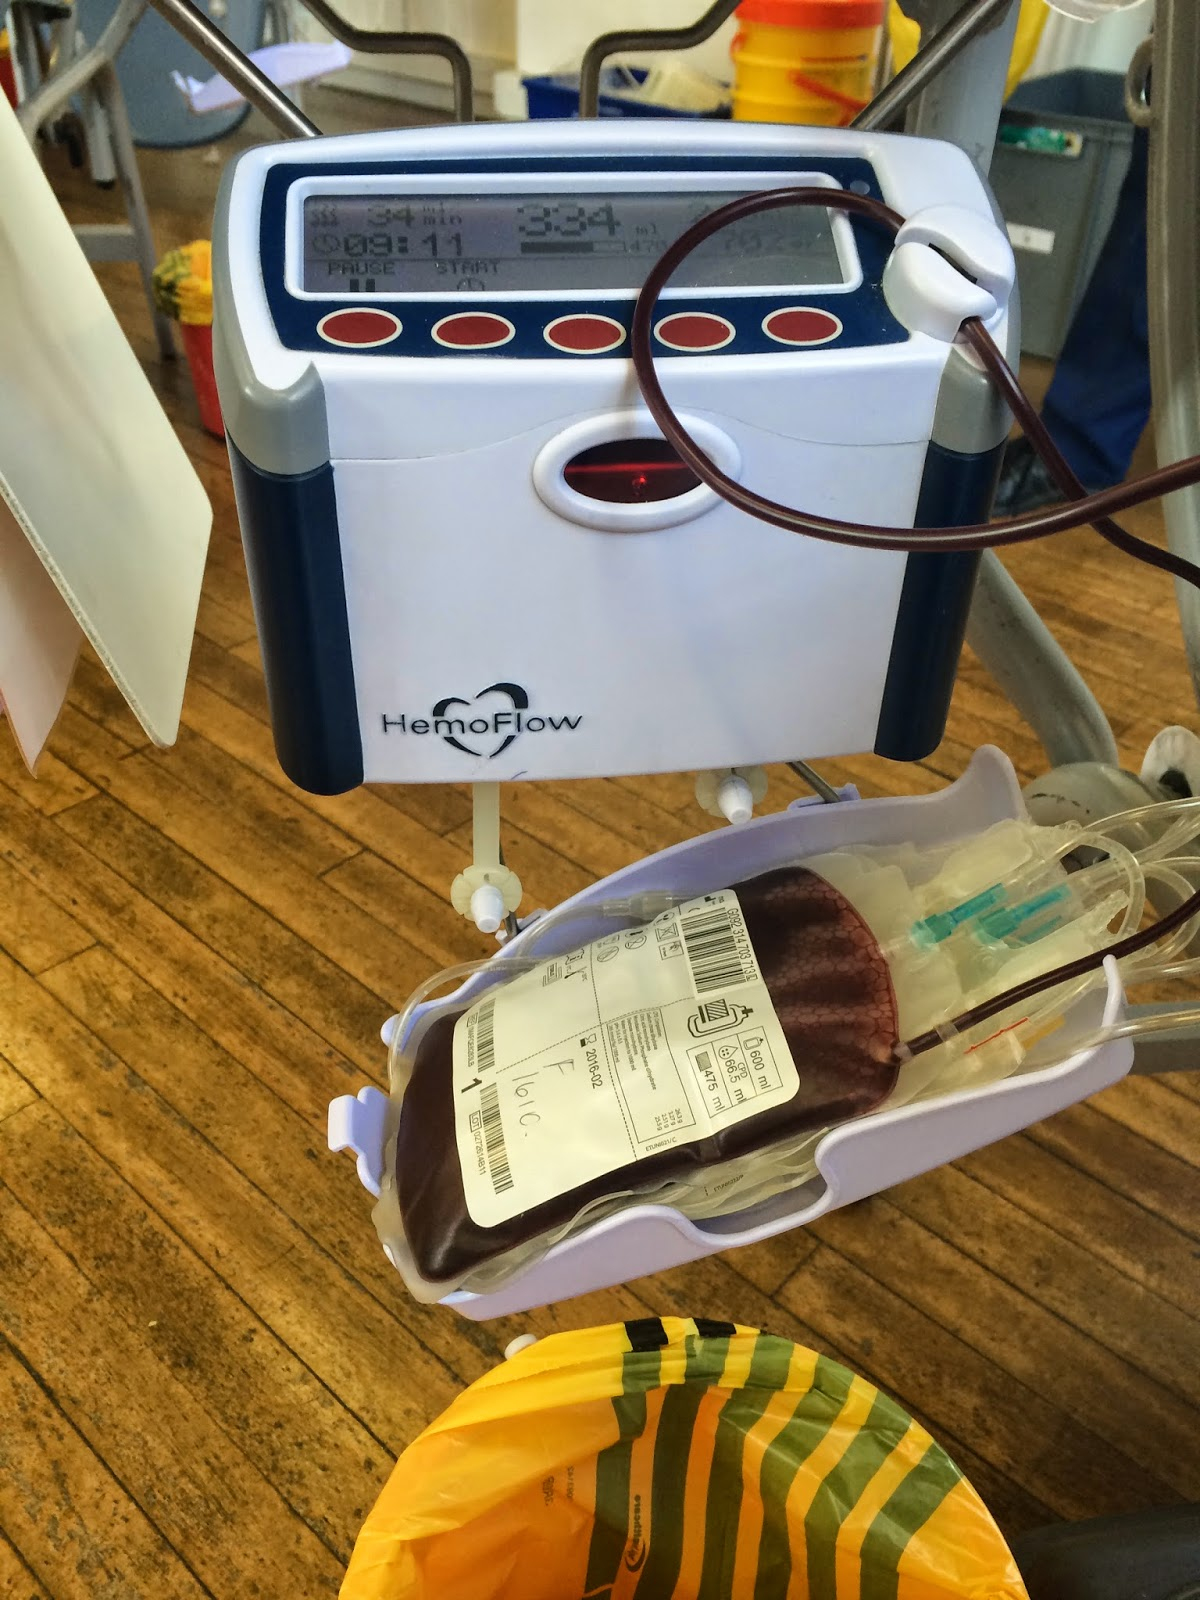 give-blood-machine